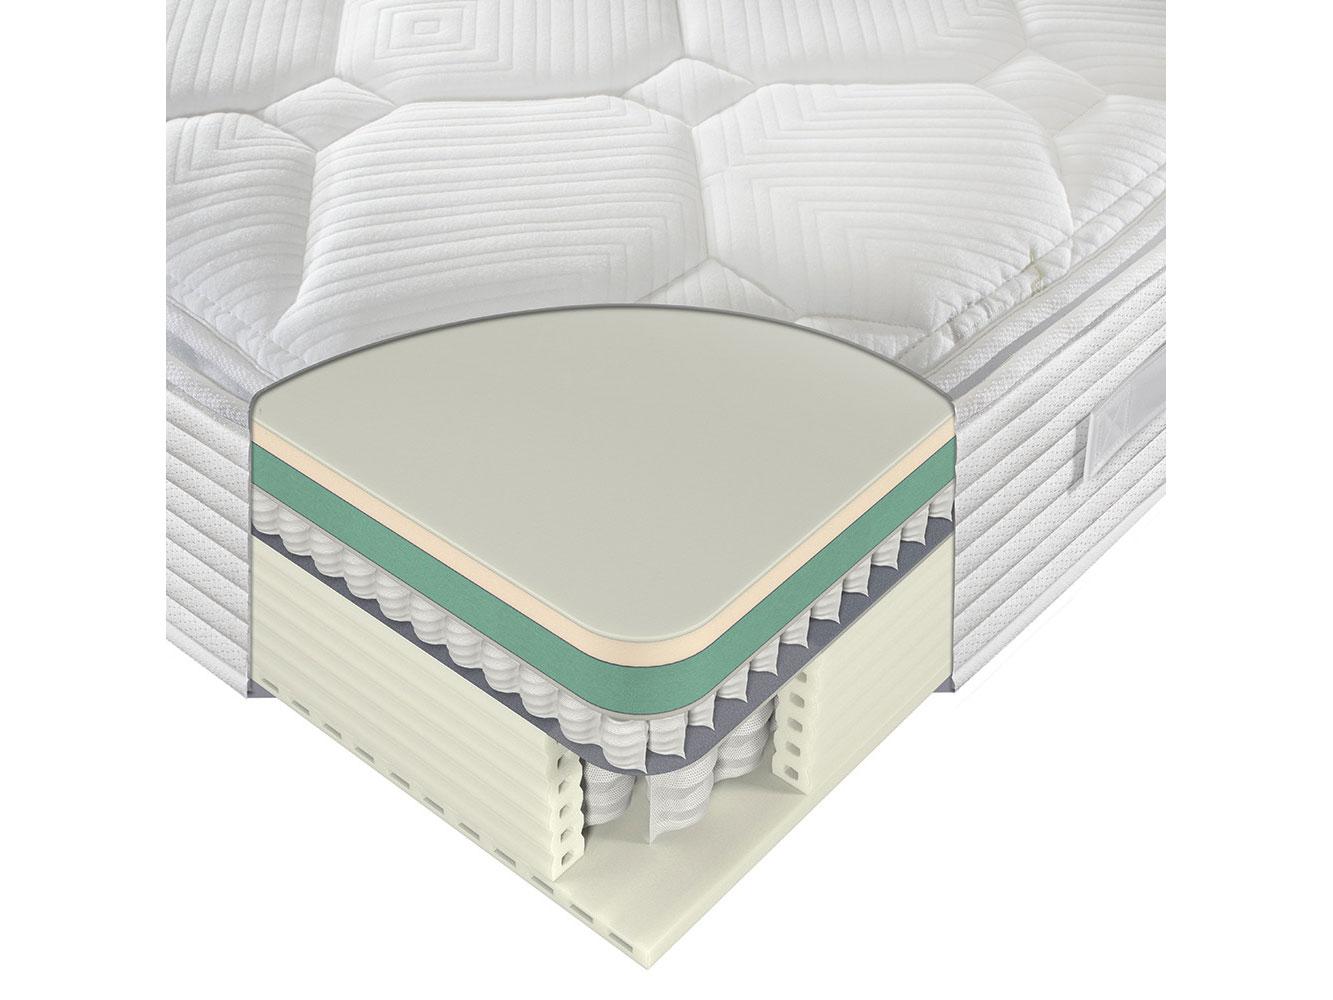 4ft6 Double Sealy Activsleep Geltex Pocket Pillow Top 2200